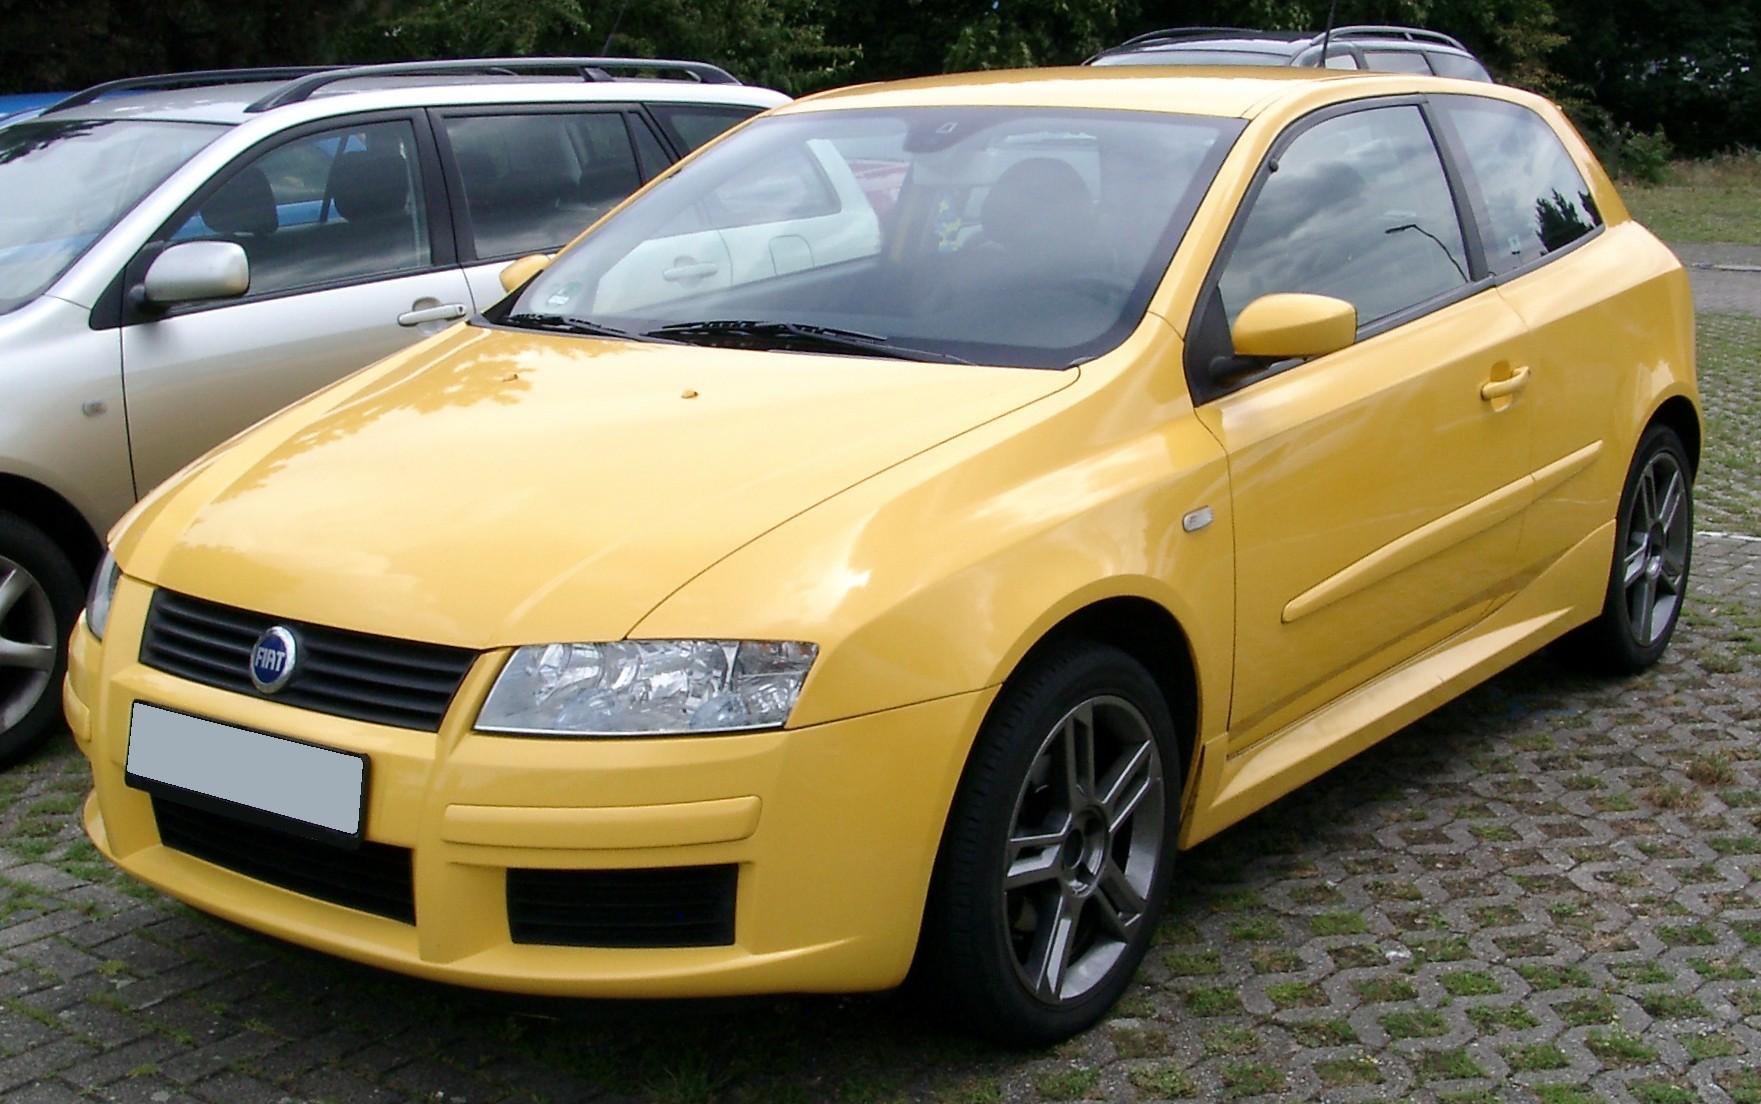 Fiat_Stilo_front_20080711